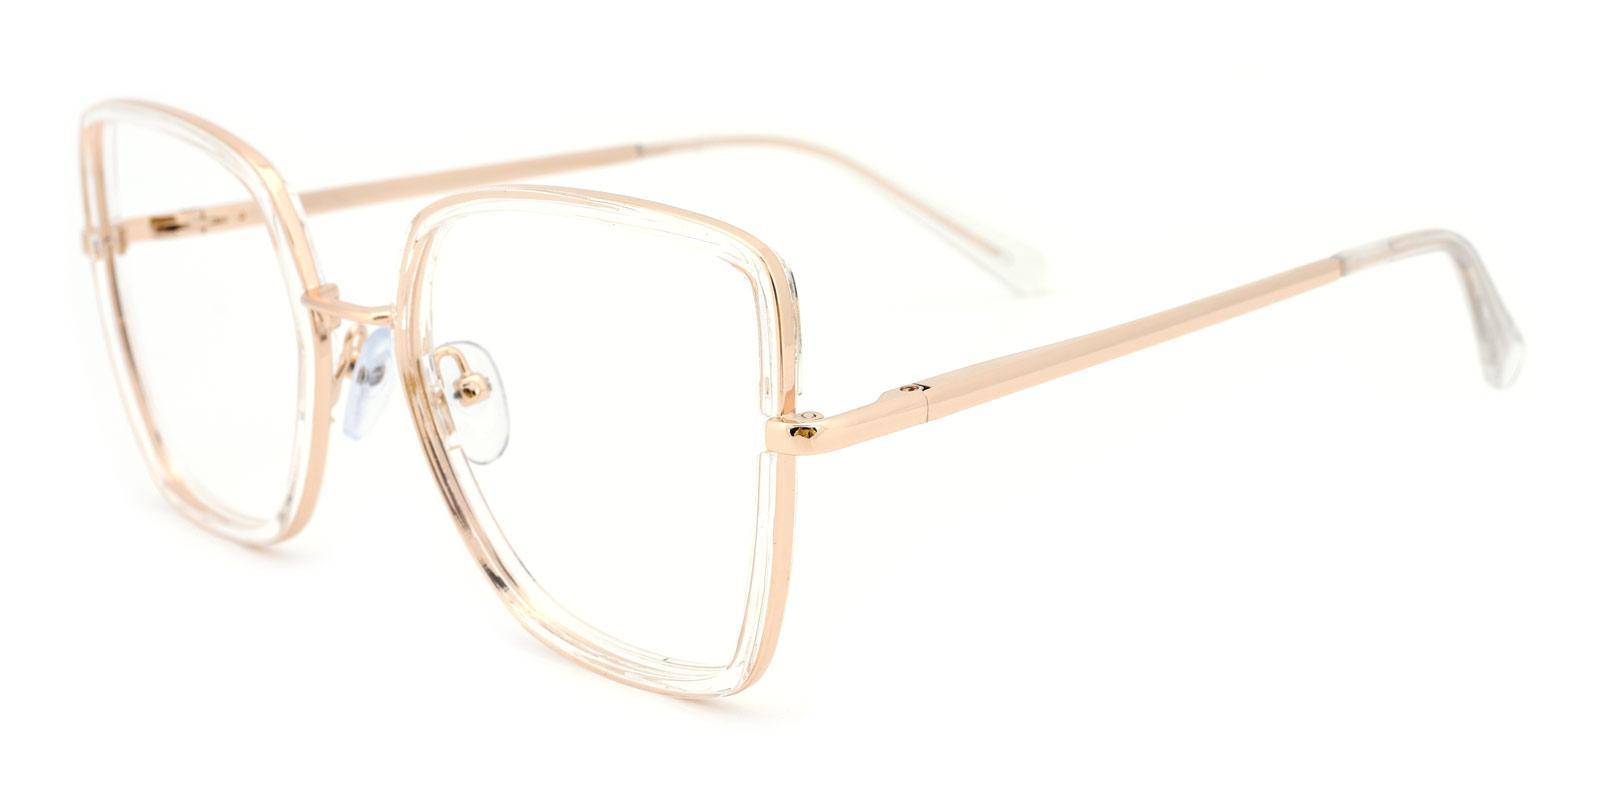 Fay-Translucent-Geometric-Combination-Eyeglasses-detail